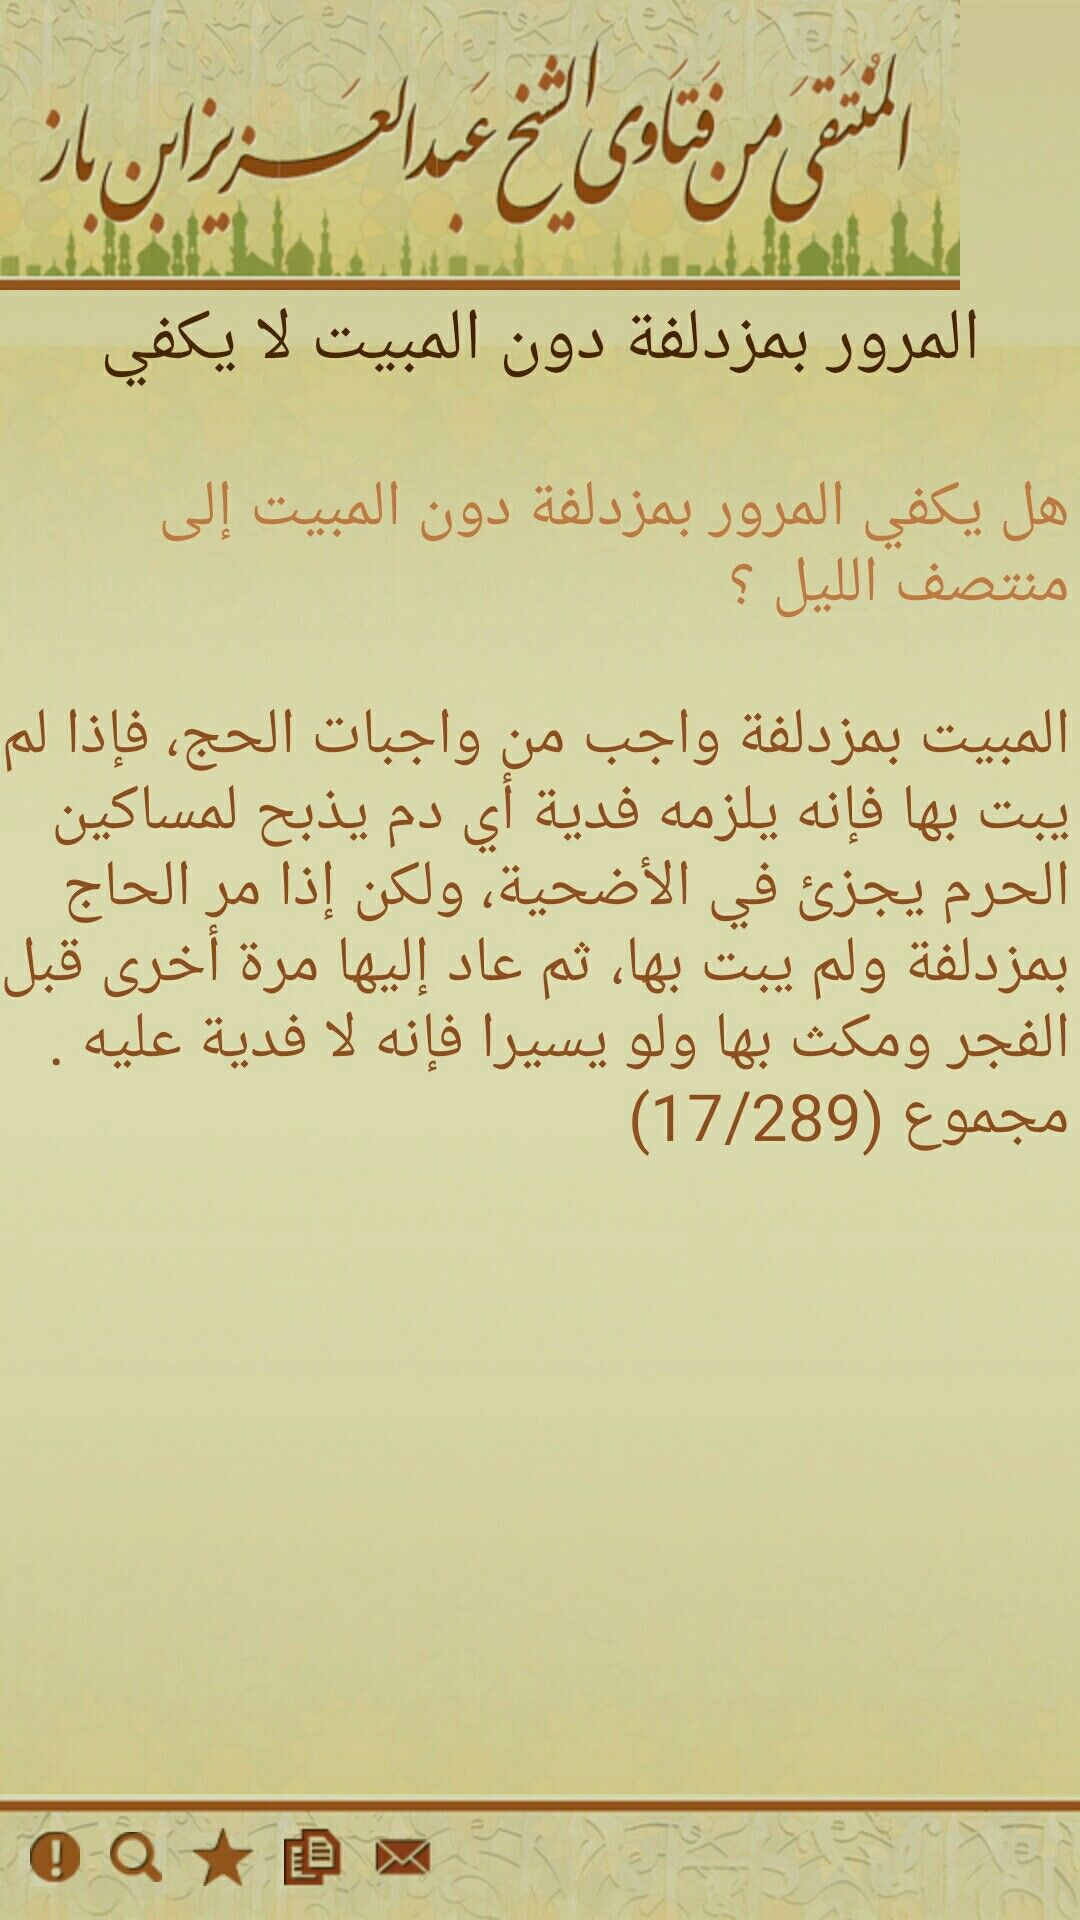 Pin By العلم الشرعي بين يديك أبوعبدال On العلم الشرعي توحيد و سنة Iyo Calligraphy Arabic Calligraphy